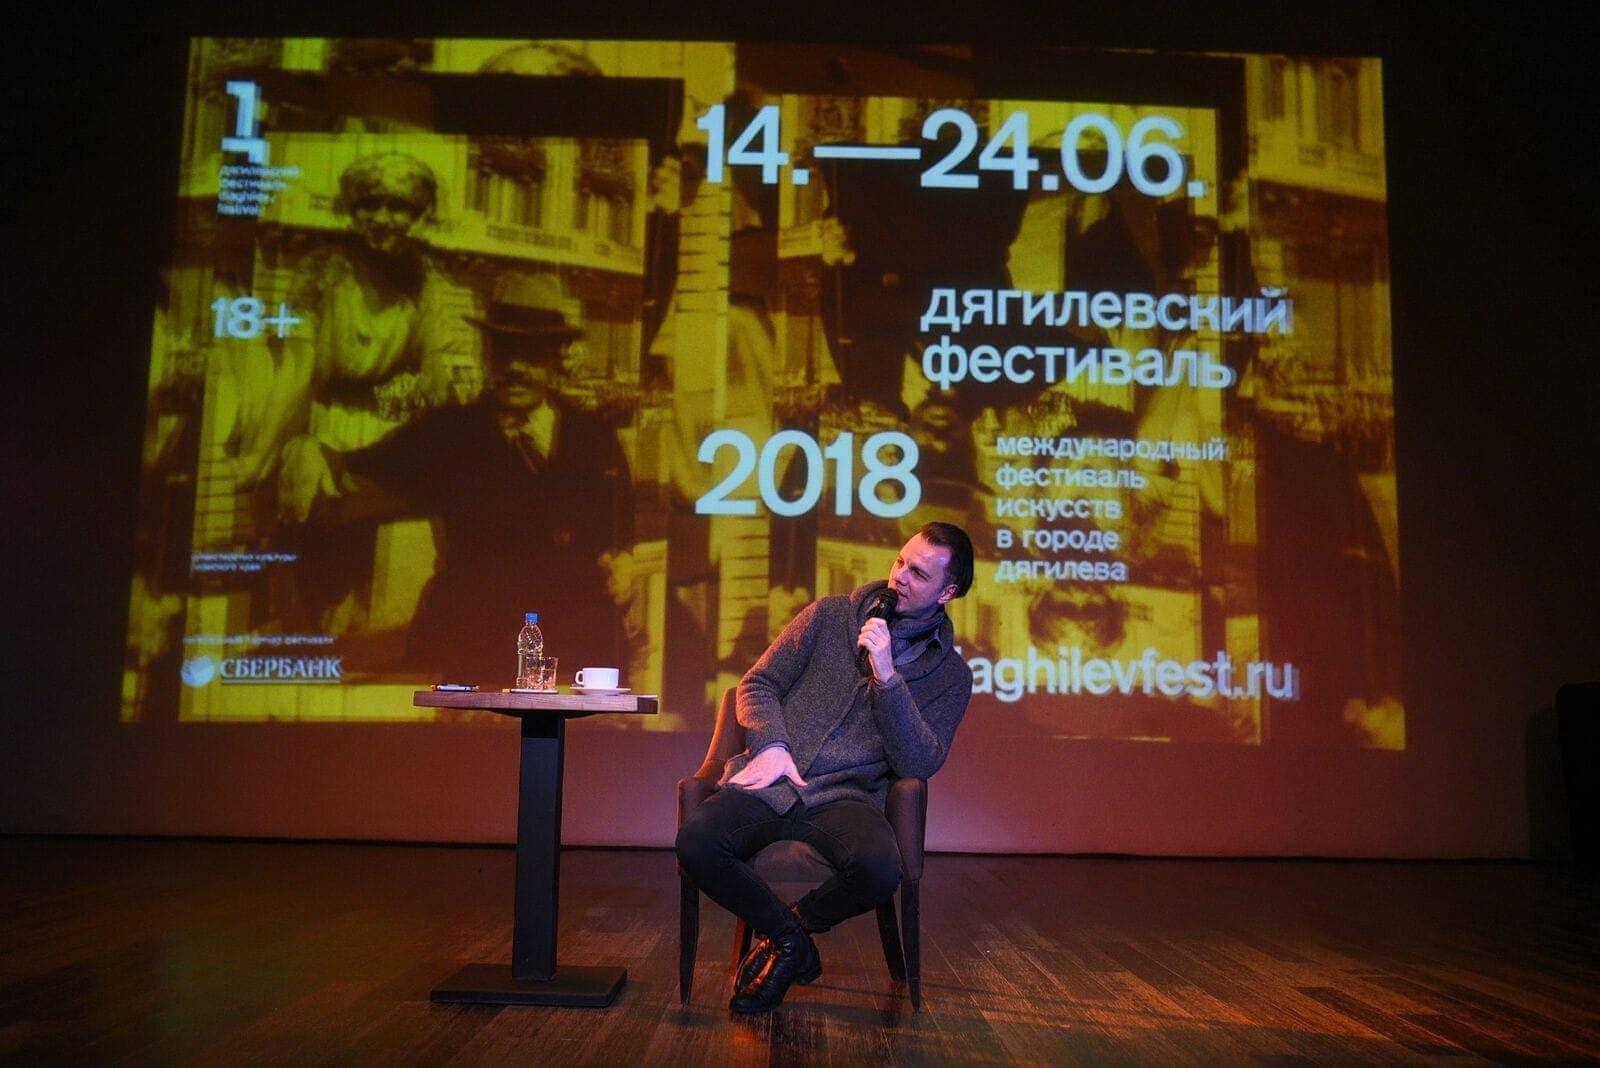 Теодор Курентзис. Фото - Никита Чунтомов